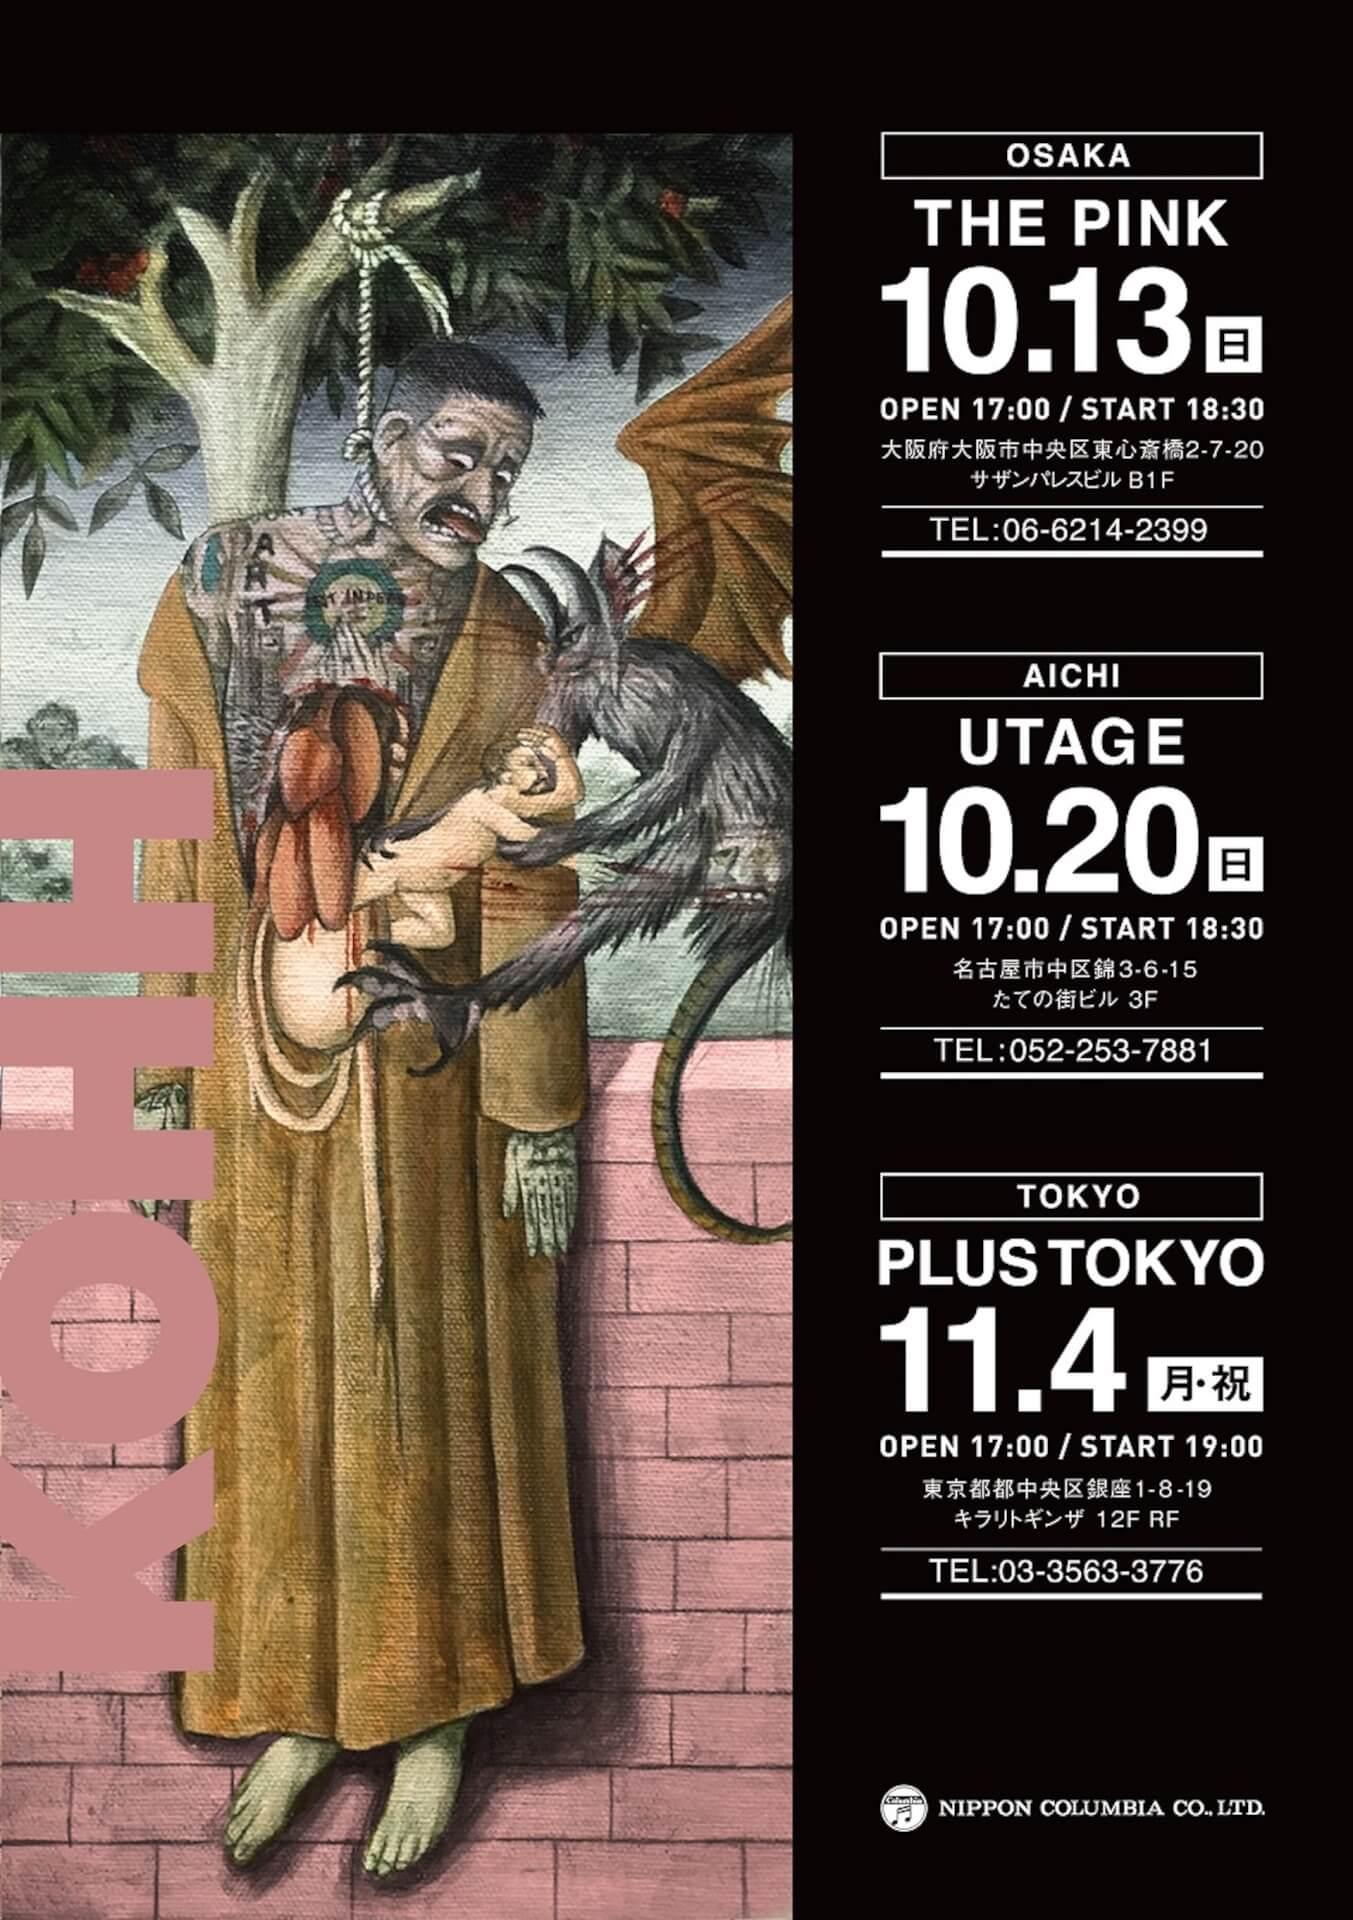 KOHH、約2年7ヶ月ぶりの国内ツアーを発表|メンバーズサイト「王子復興財団」にてチケット先行発売を開始 music190821-kohh-1